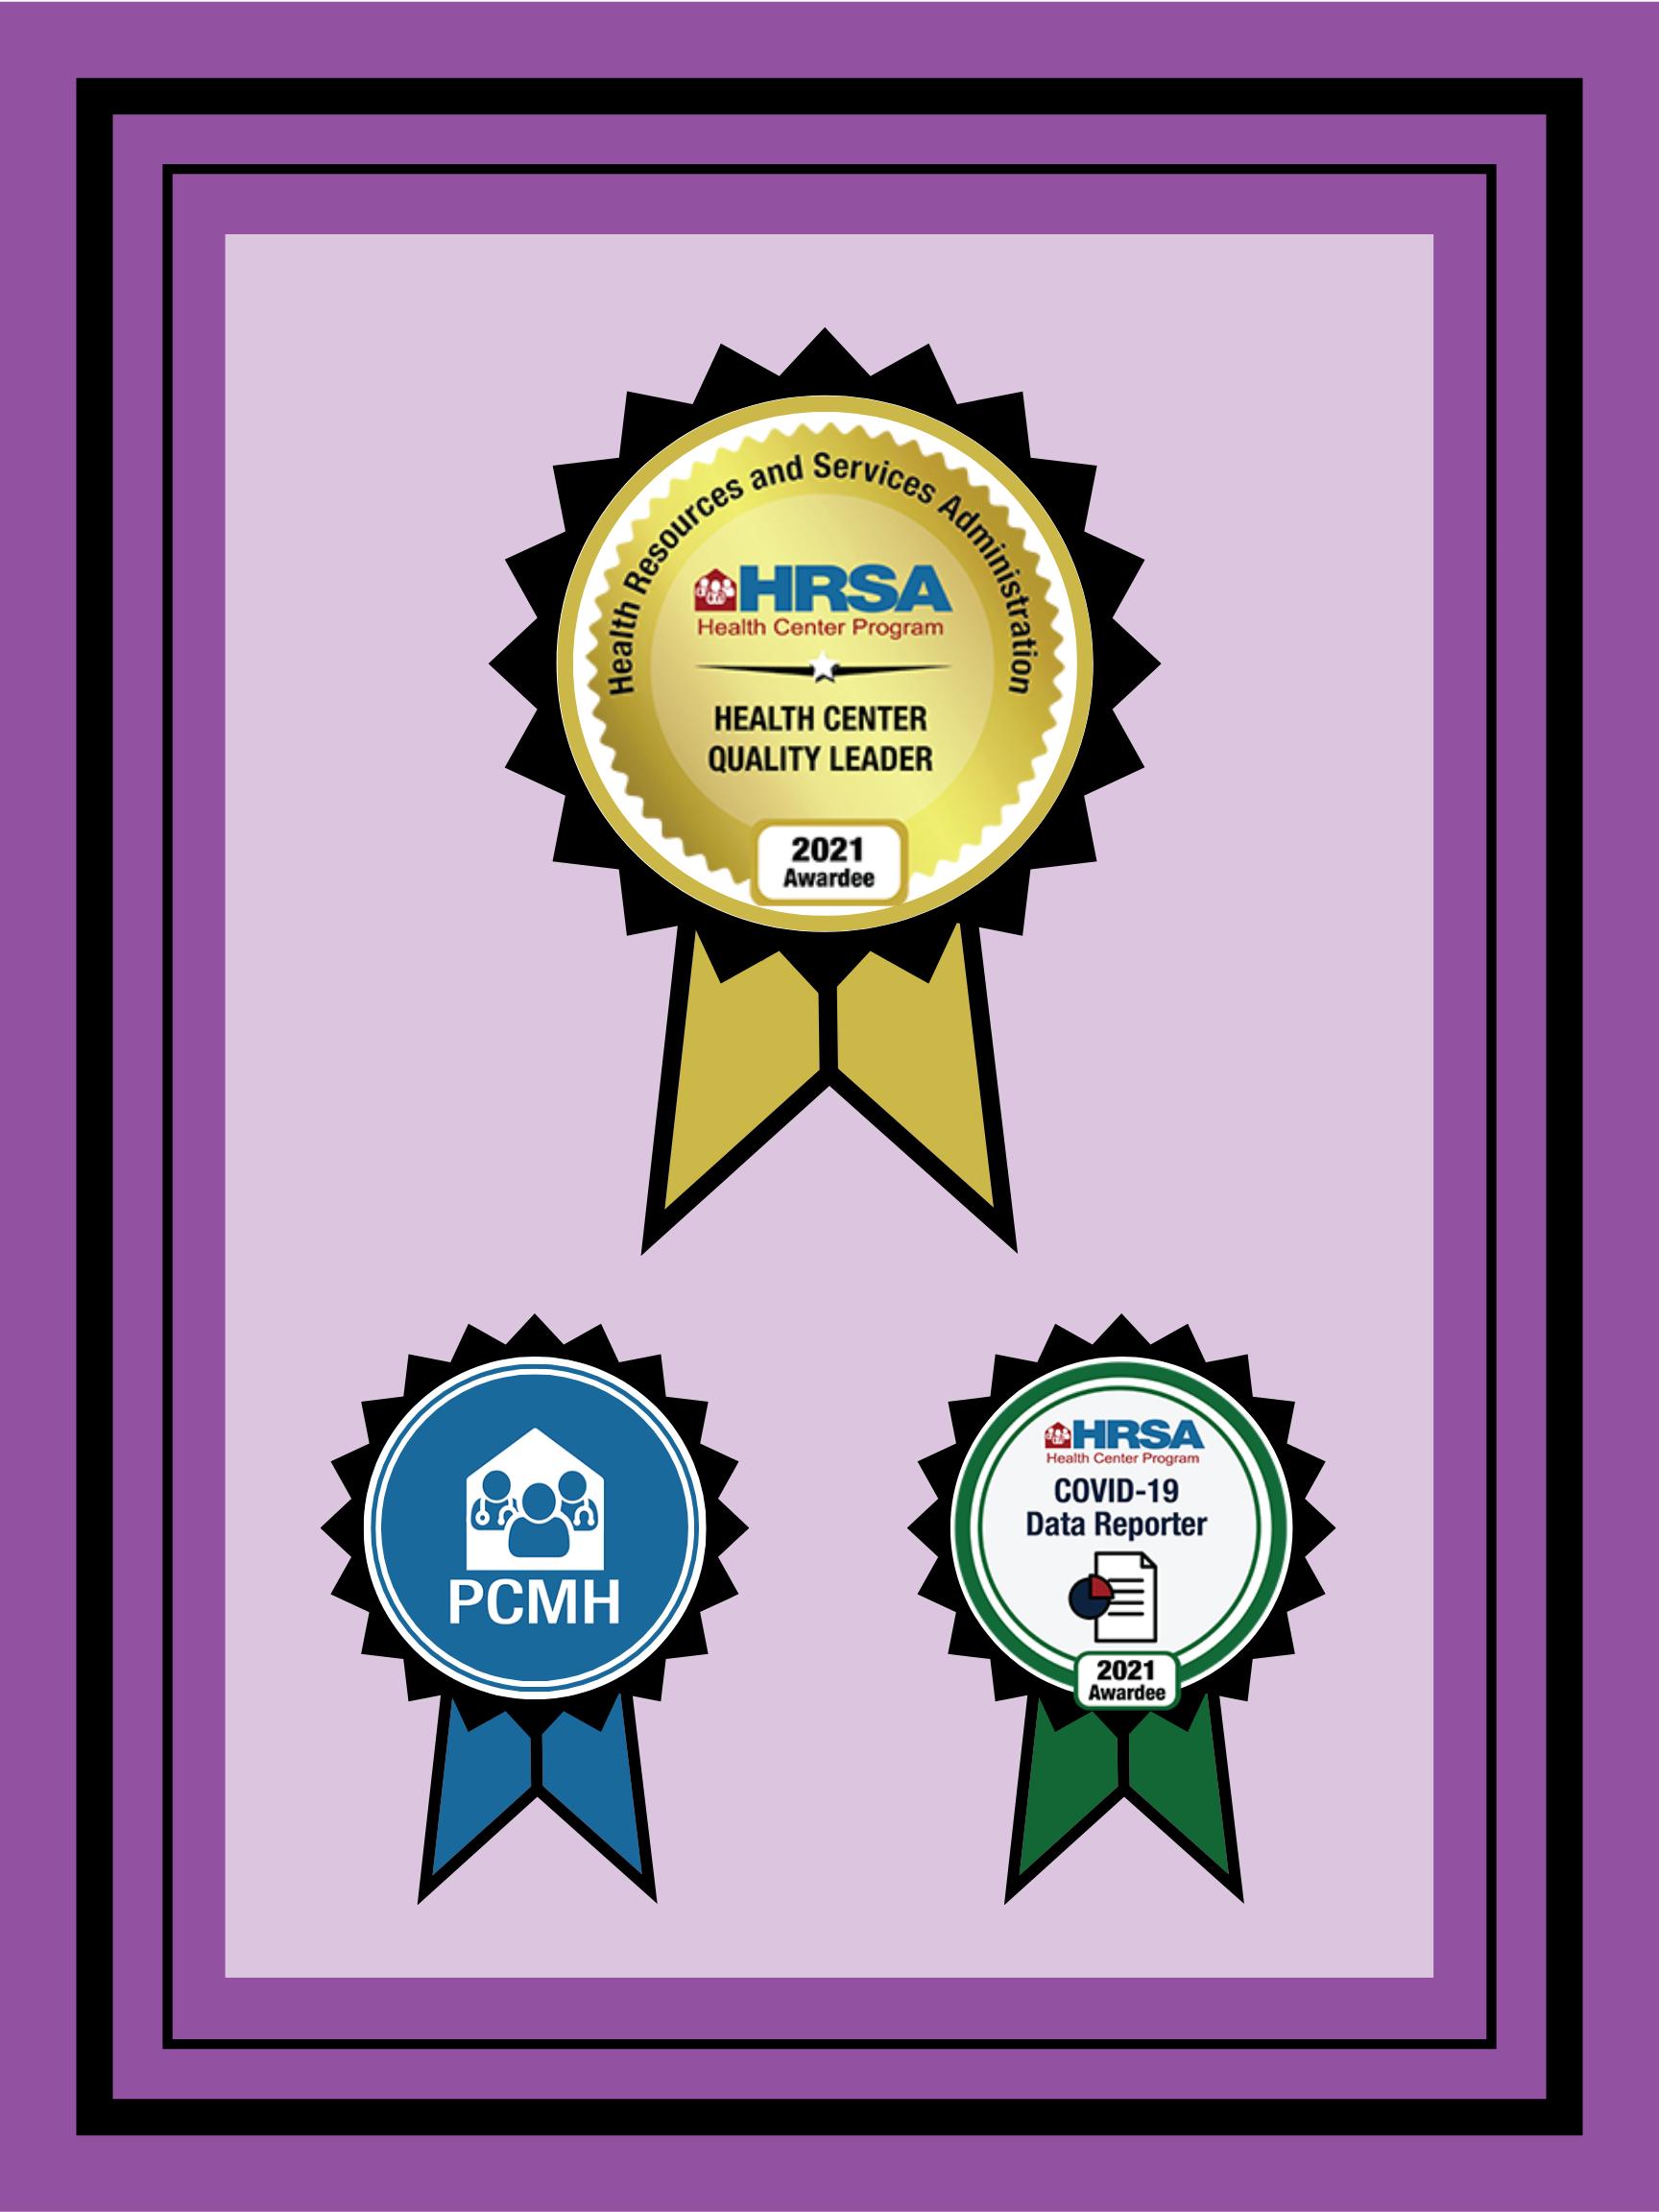 HRSA 2021 Quality Awards